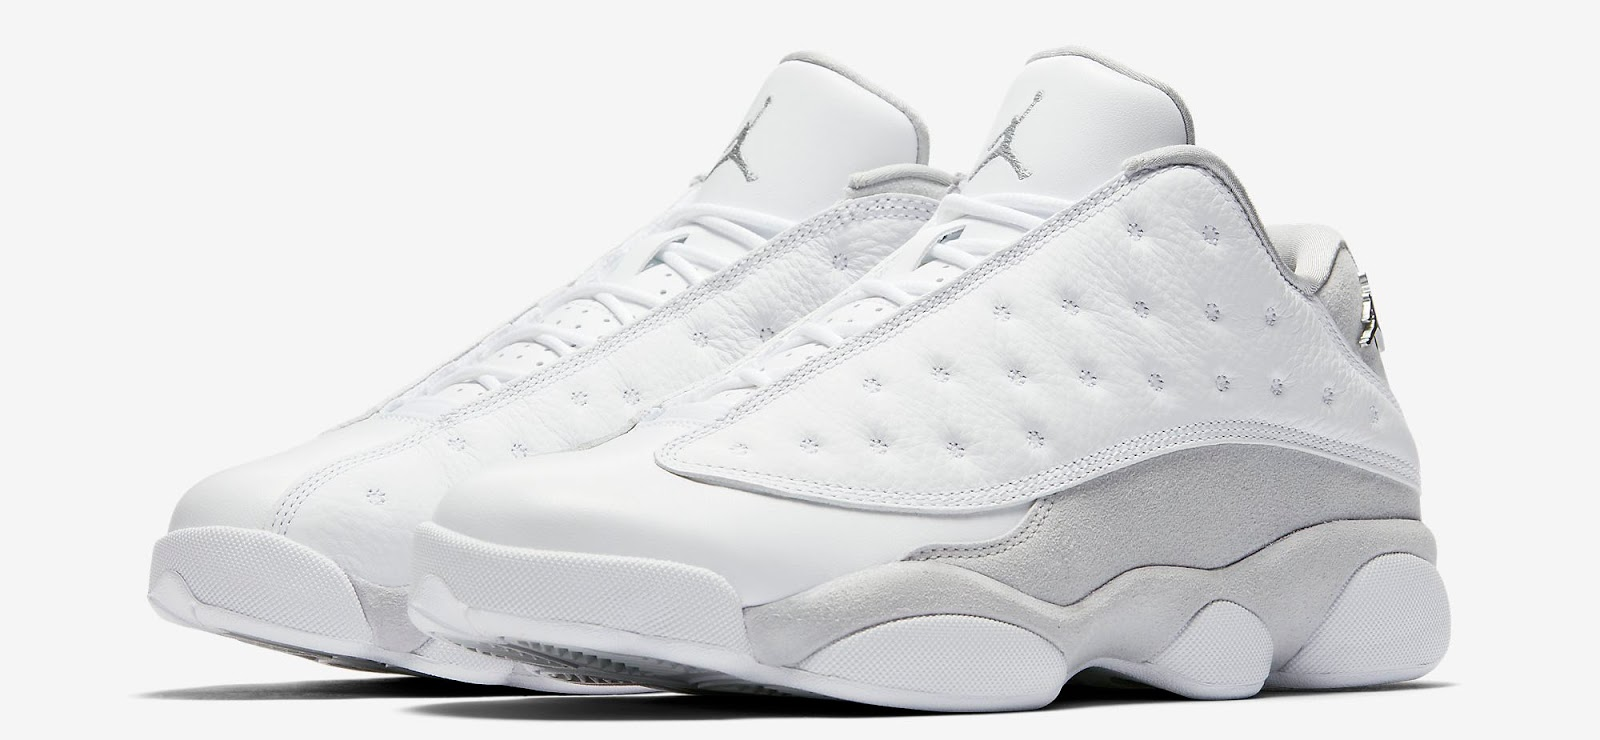 26a19cdcbff5 ajordanxi Your  1 Source For Sneaker Release Dates  Air Jordan 13 ...